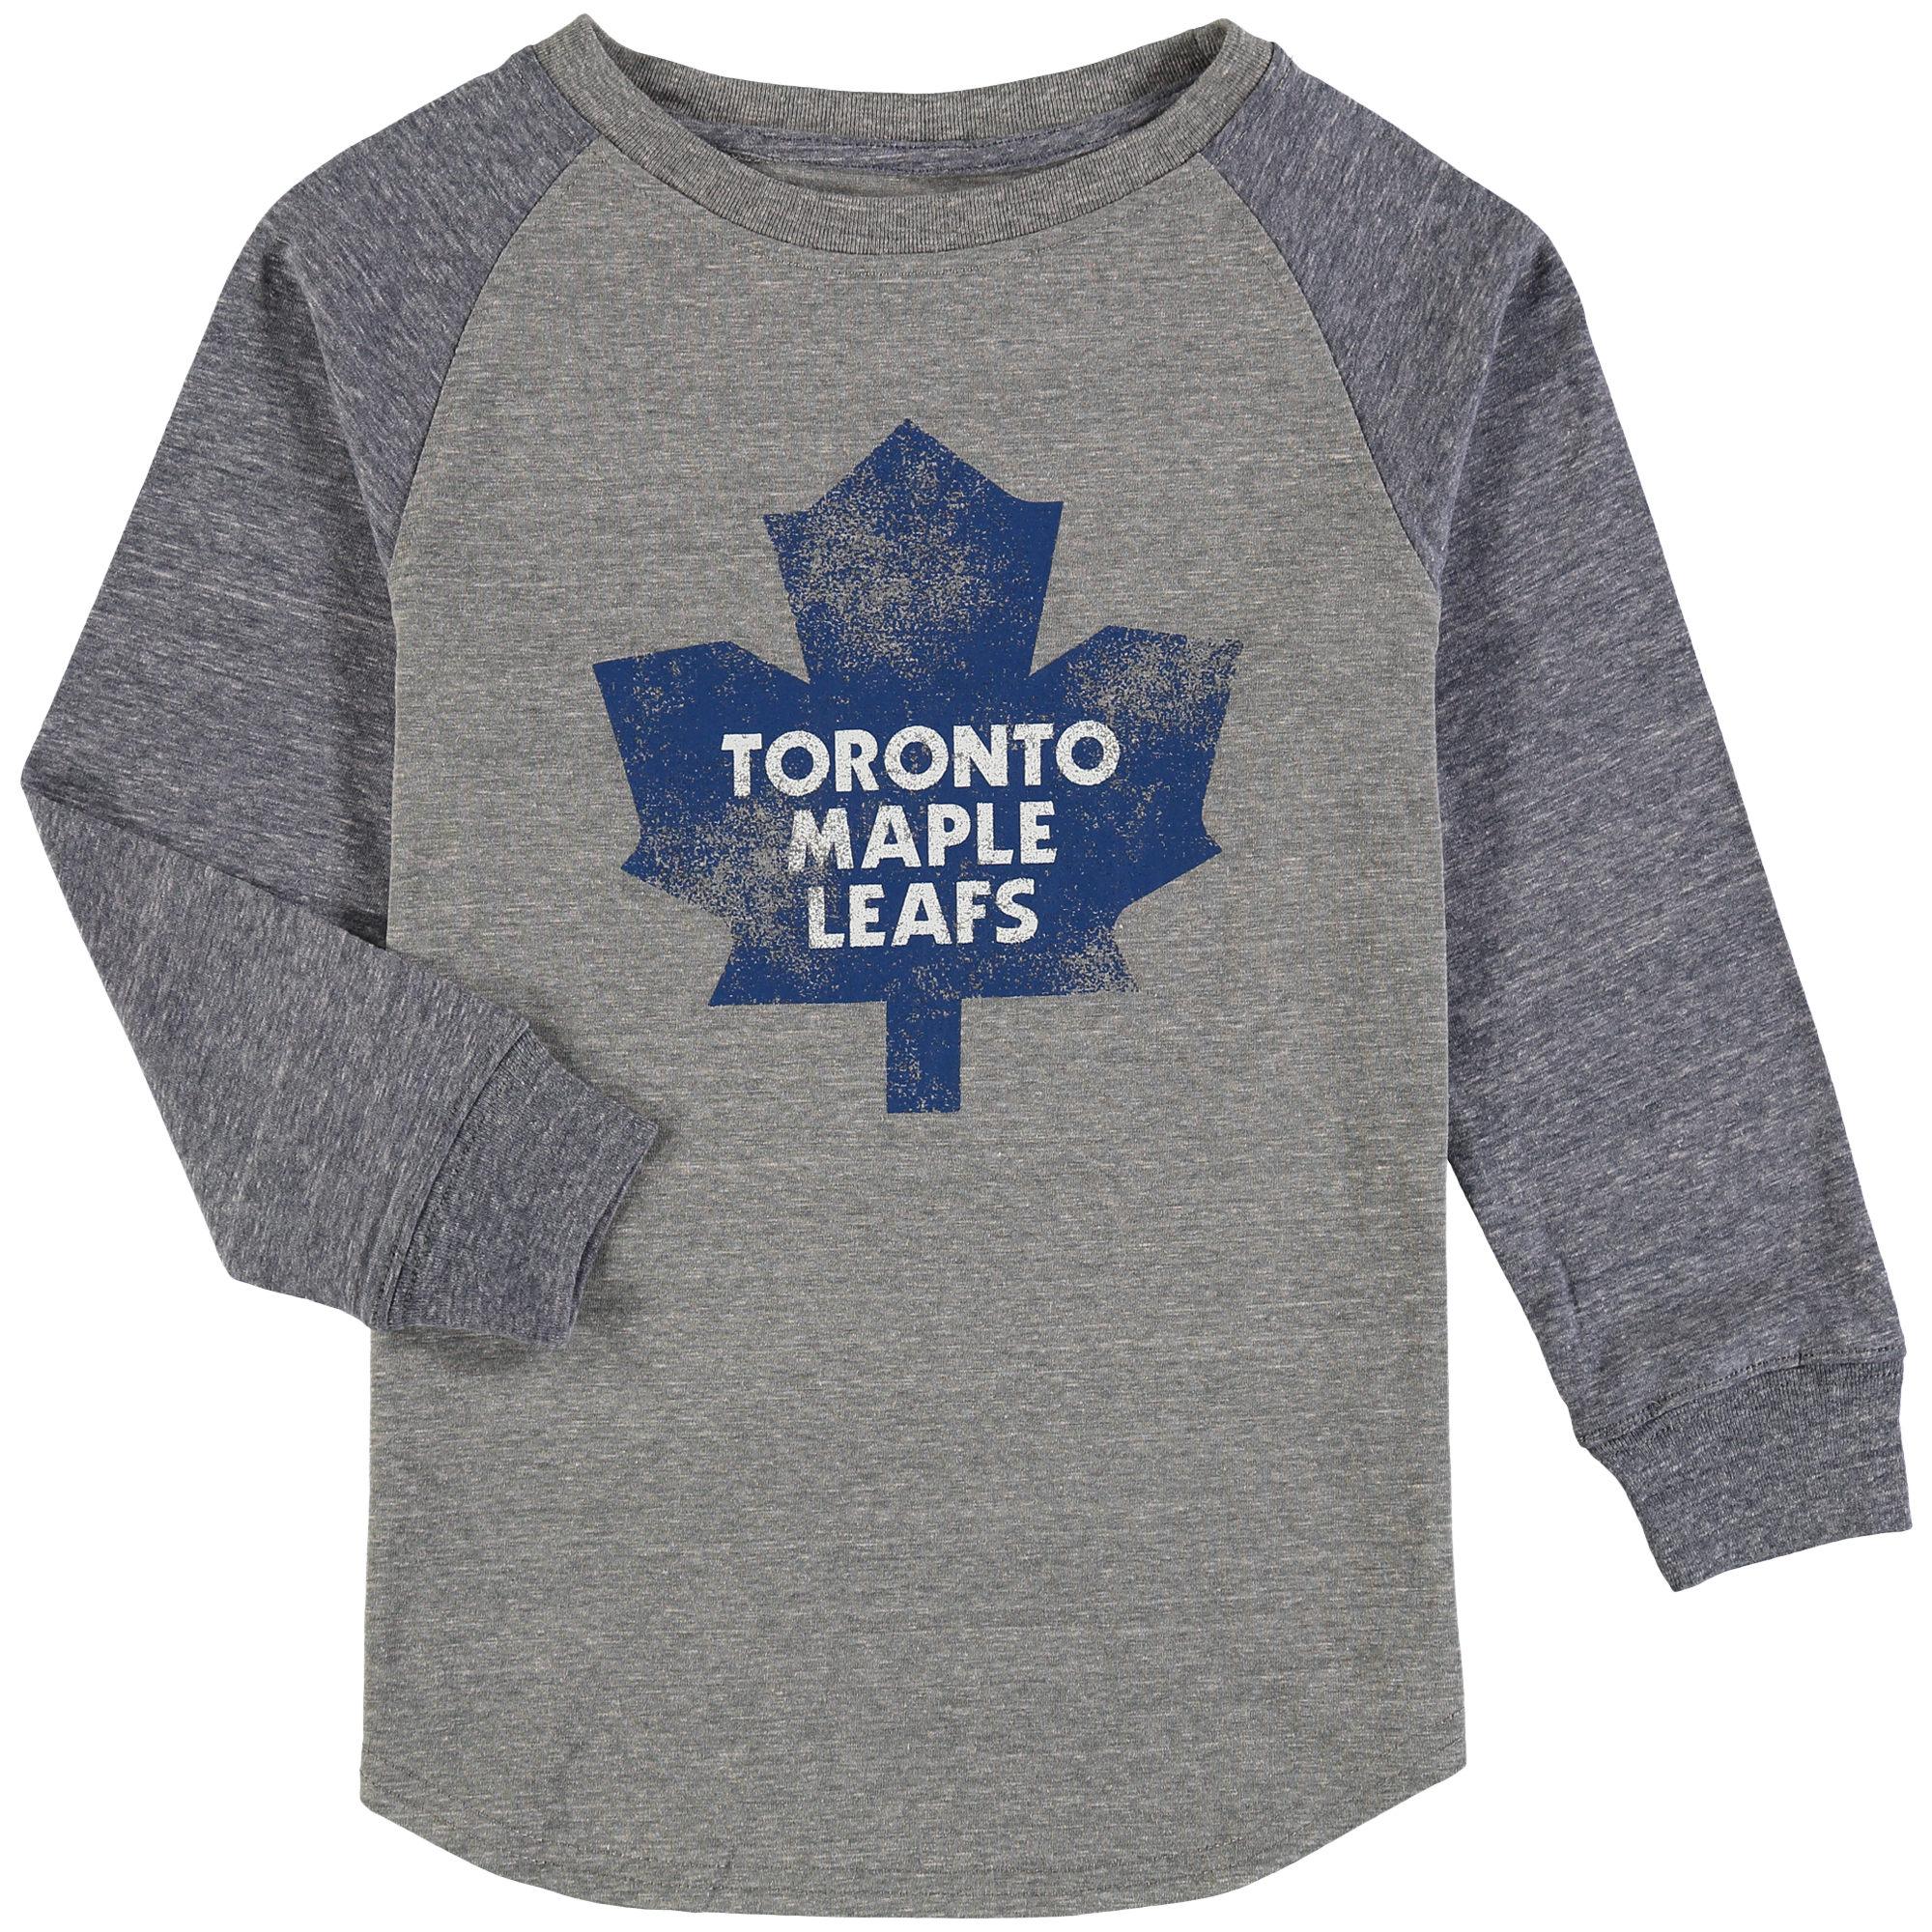 Toronto Maple Leafs Fanatics Branded Youth Distressed Alternate Long Sleeve Raglan Tri-Blend T-Shirt - Heathered Gray